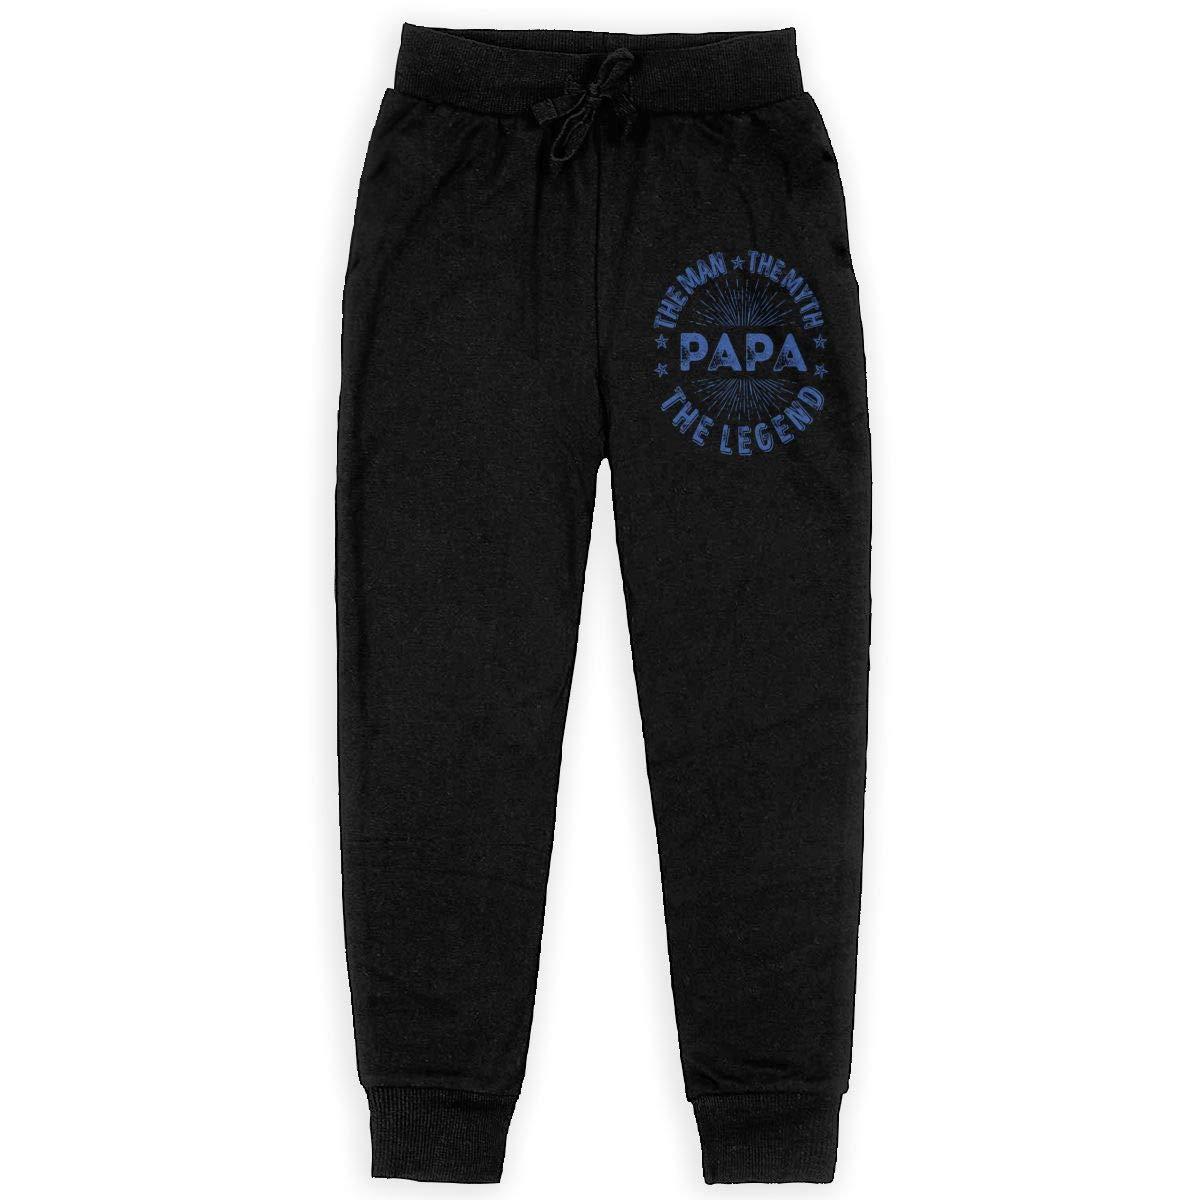 Boys Sweatpants The Man The Myth The Legend PAPA Joggers Sport Training Pants Trousers Black